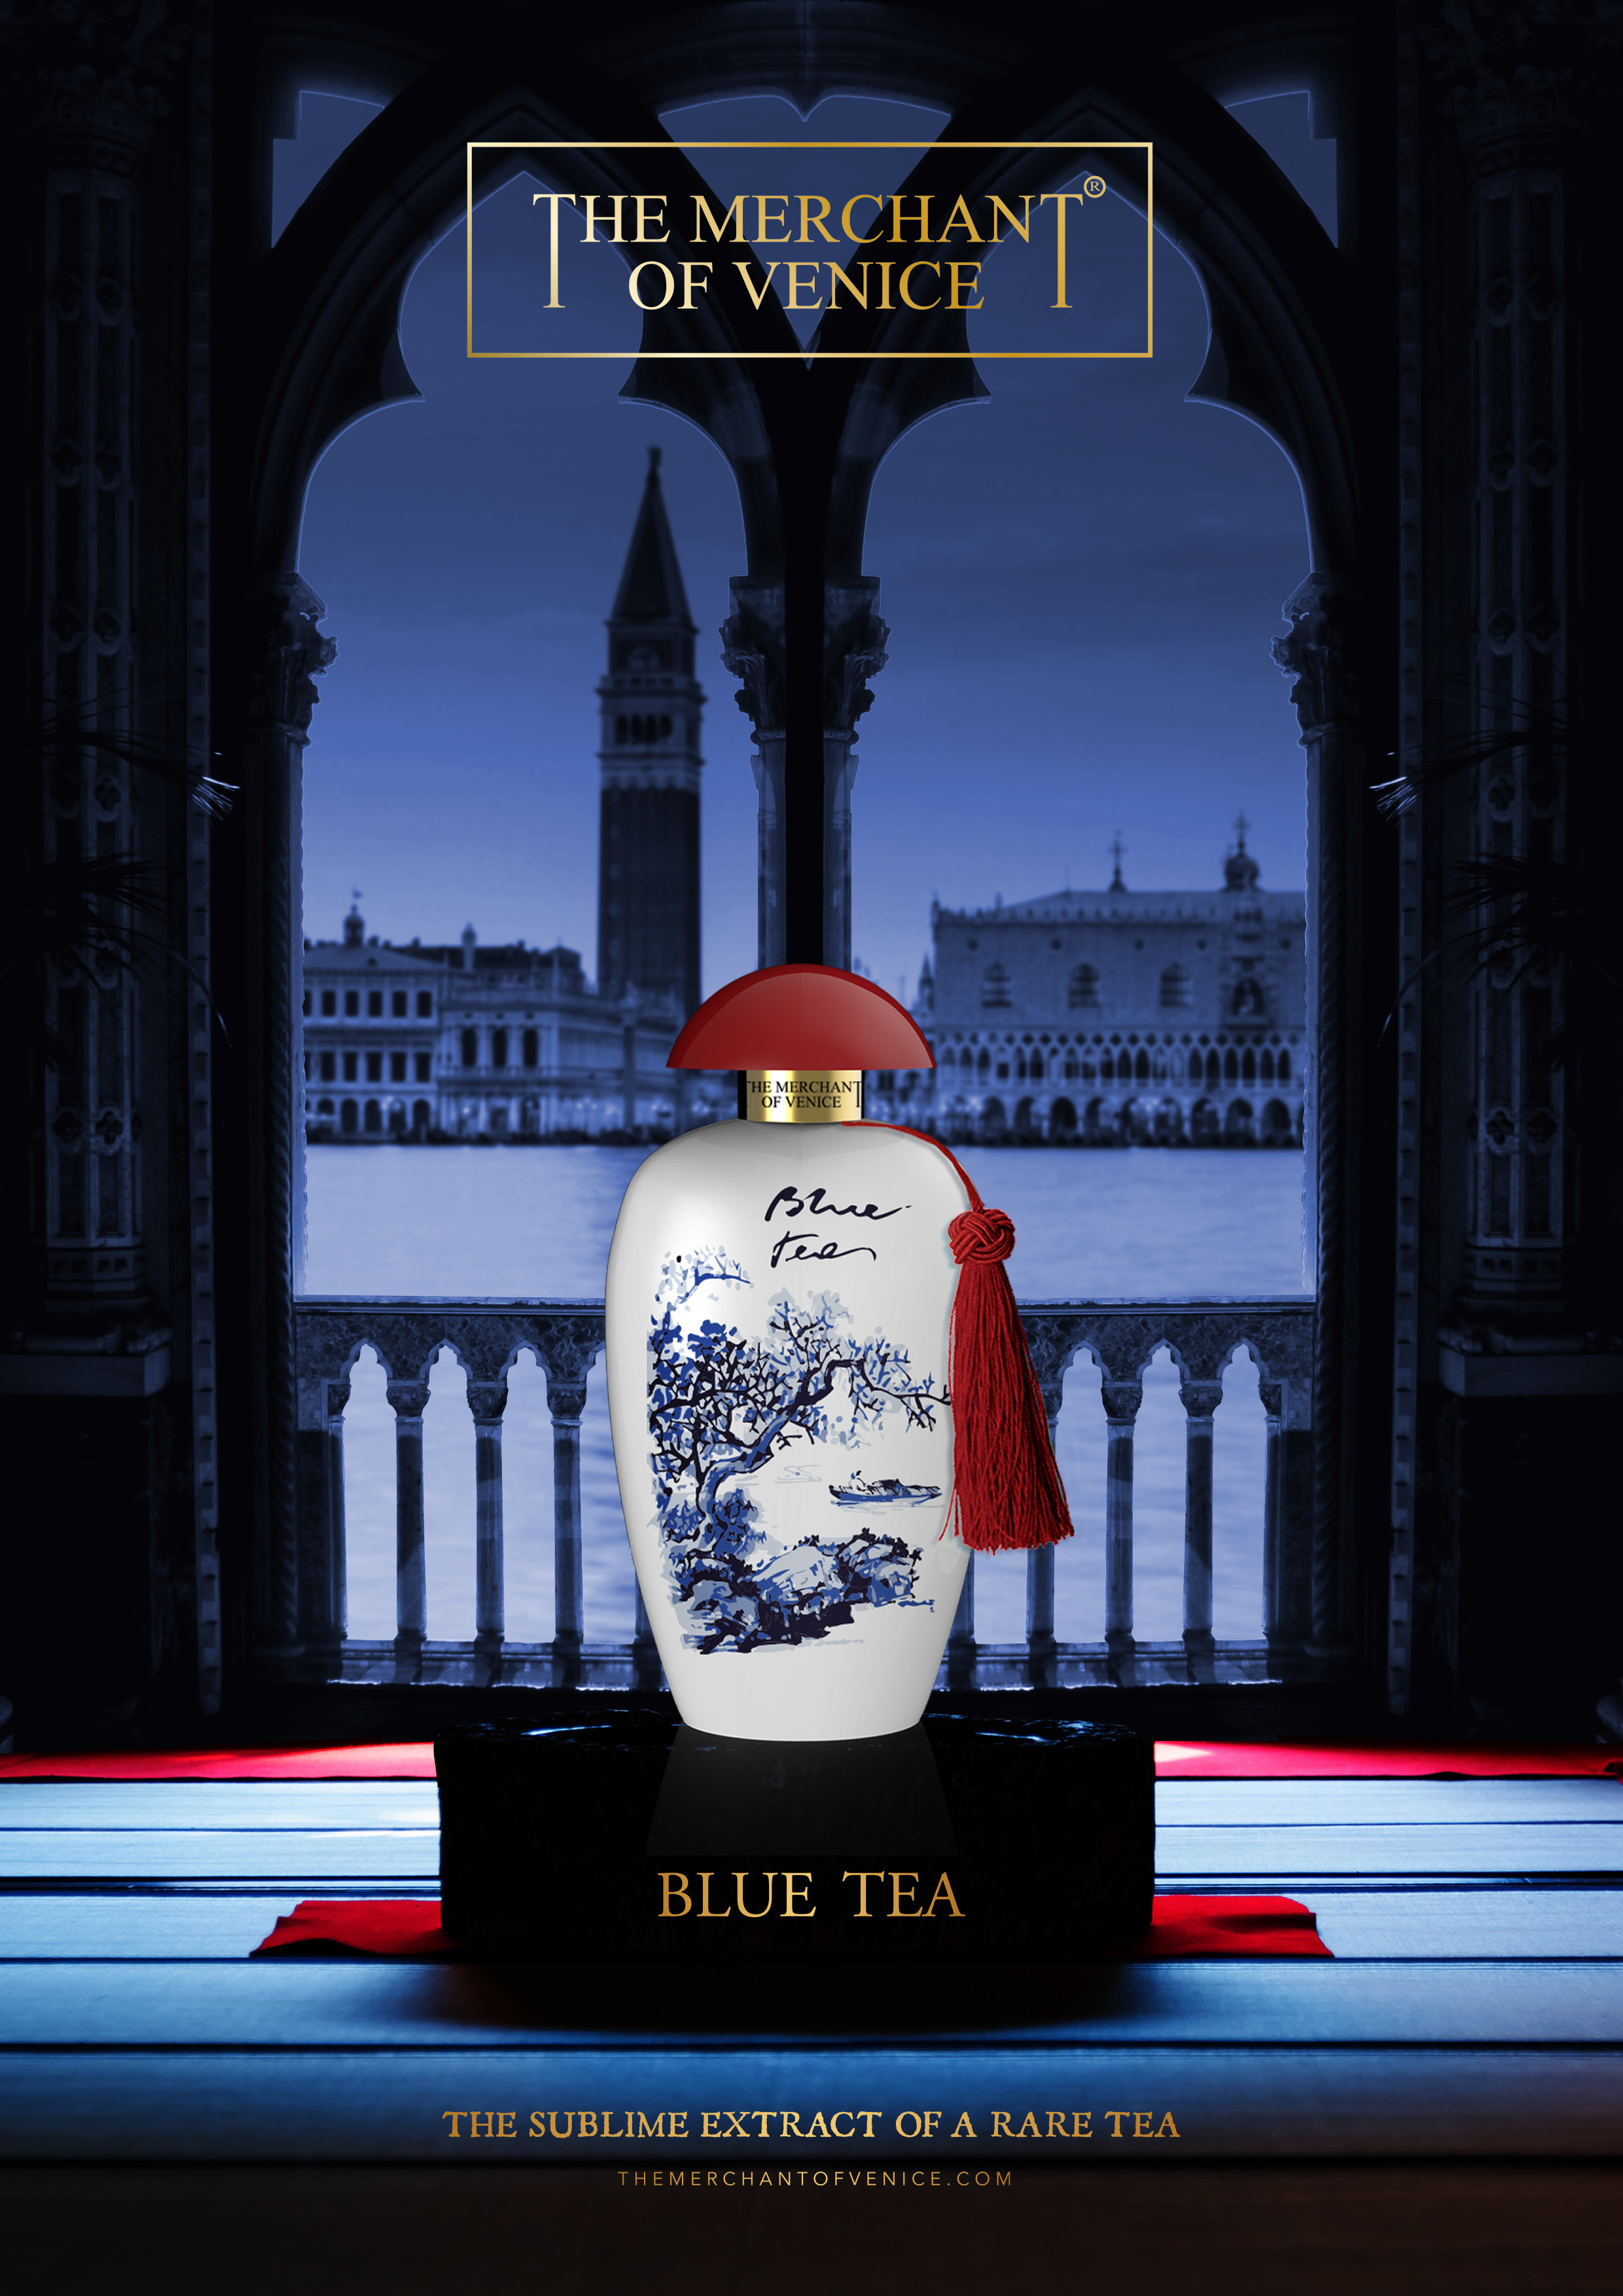 the merchant of venice blue tea